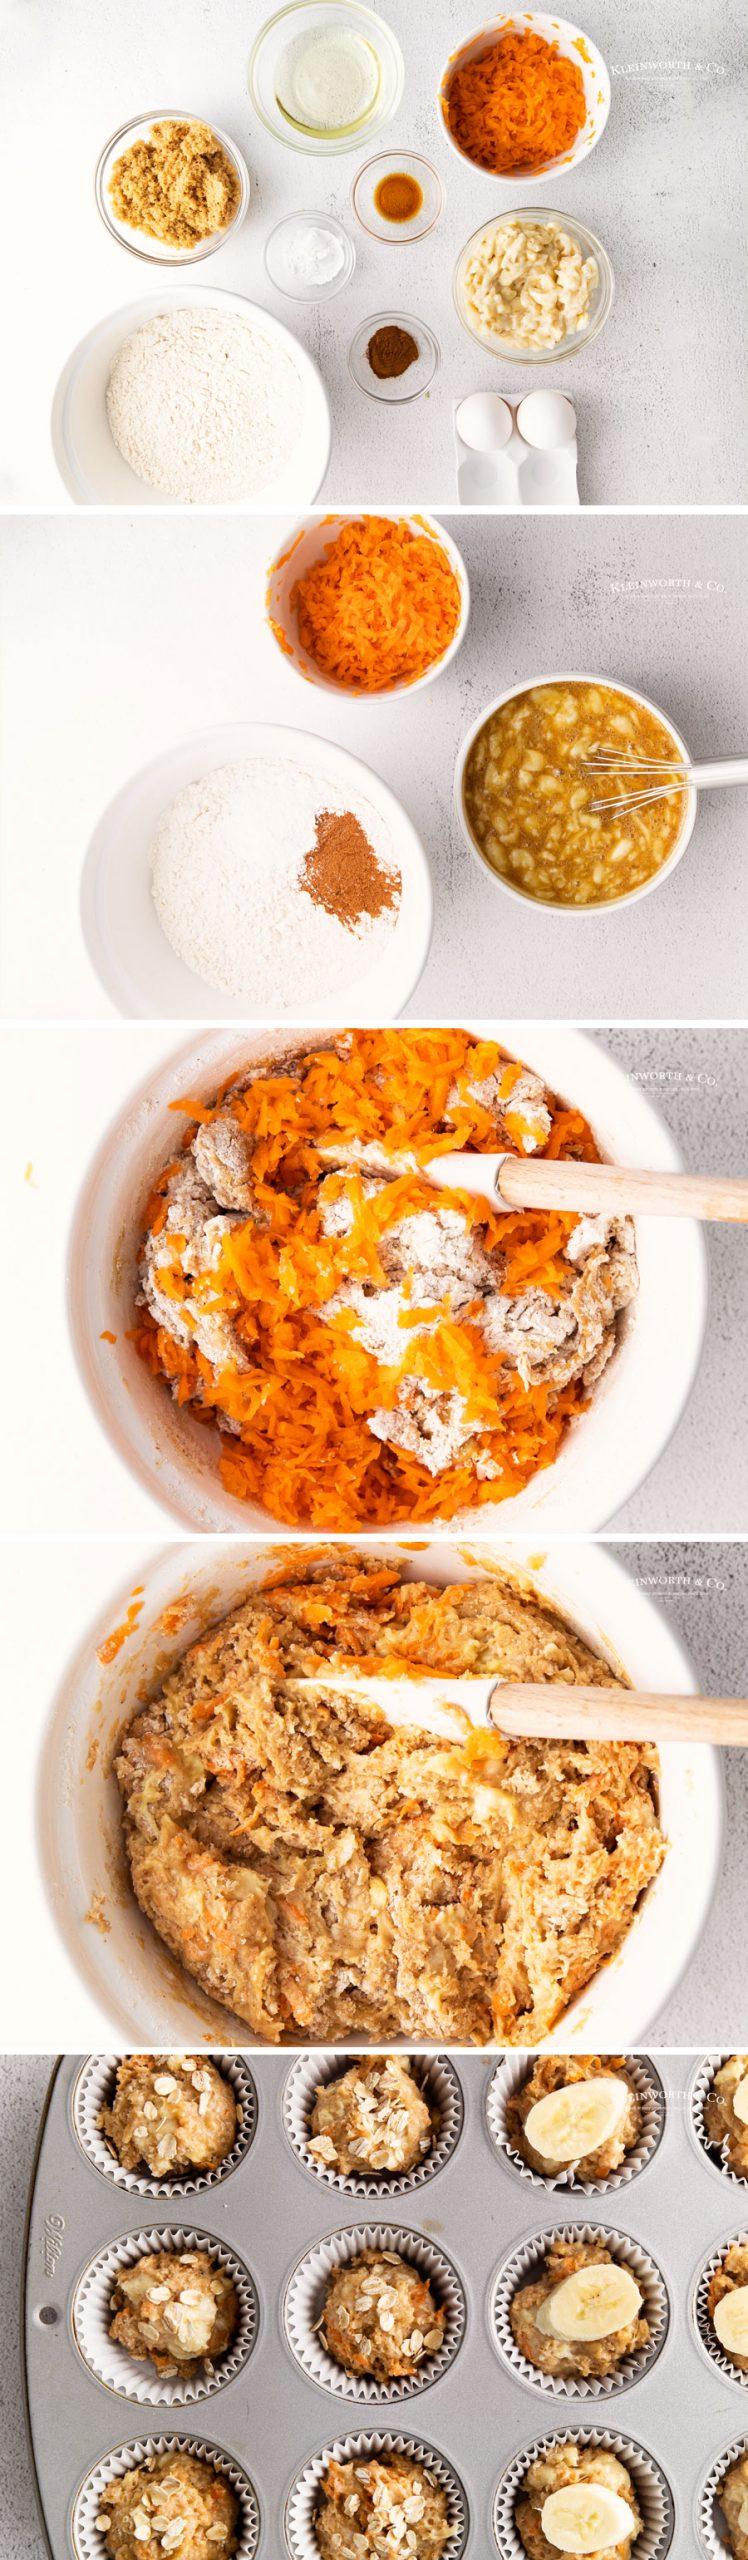 how to make Banana Carrot Muffins